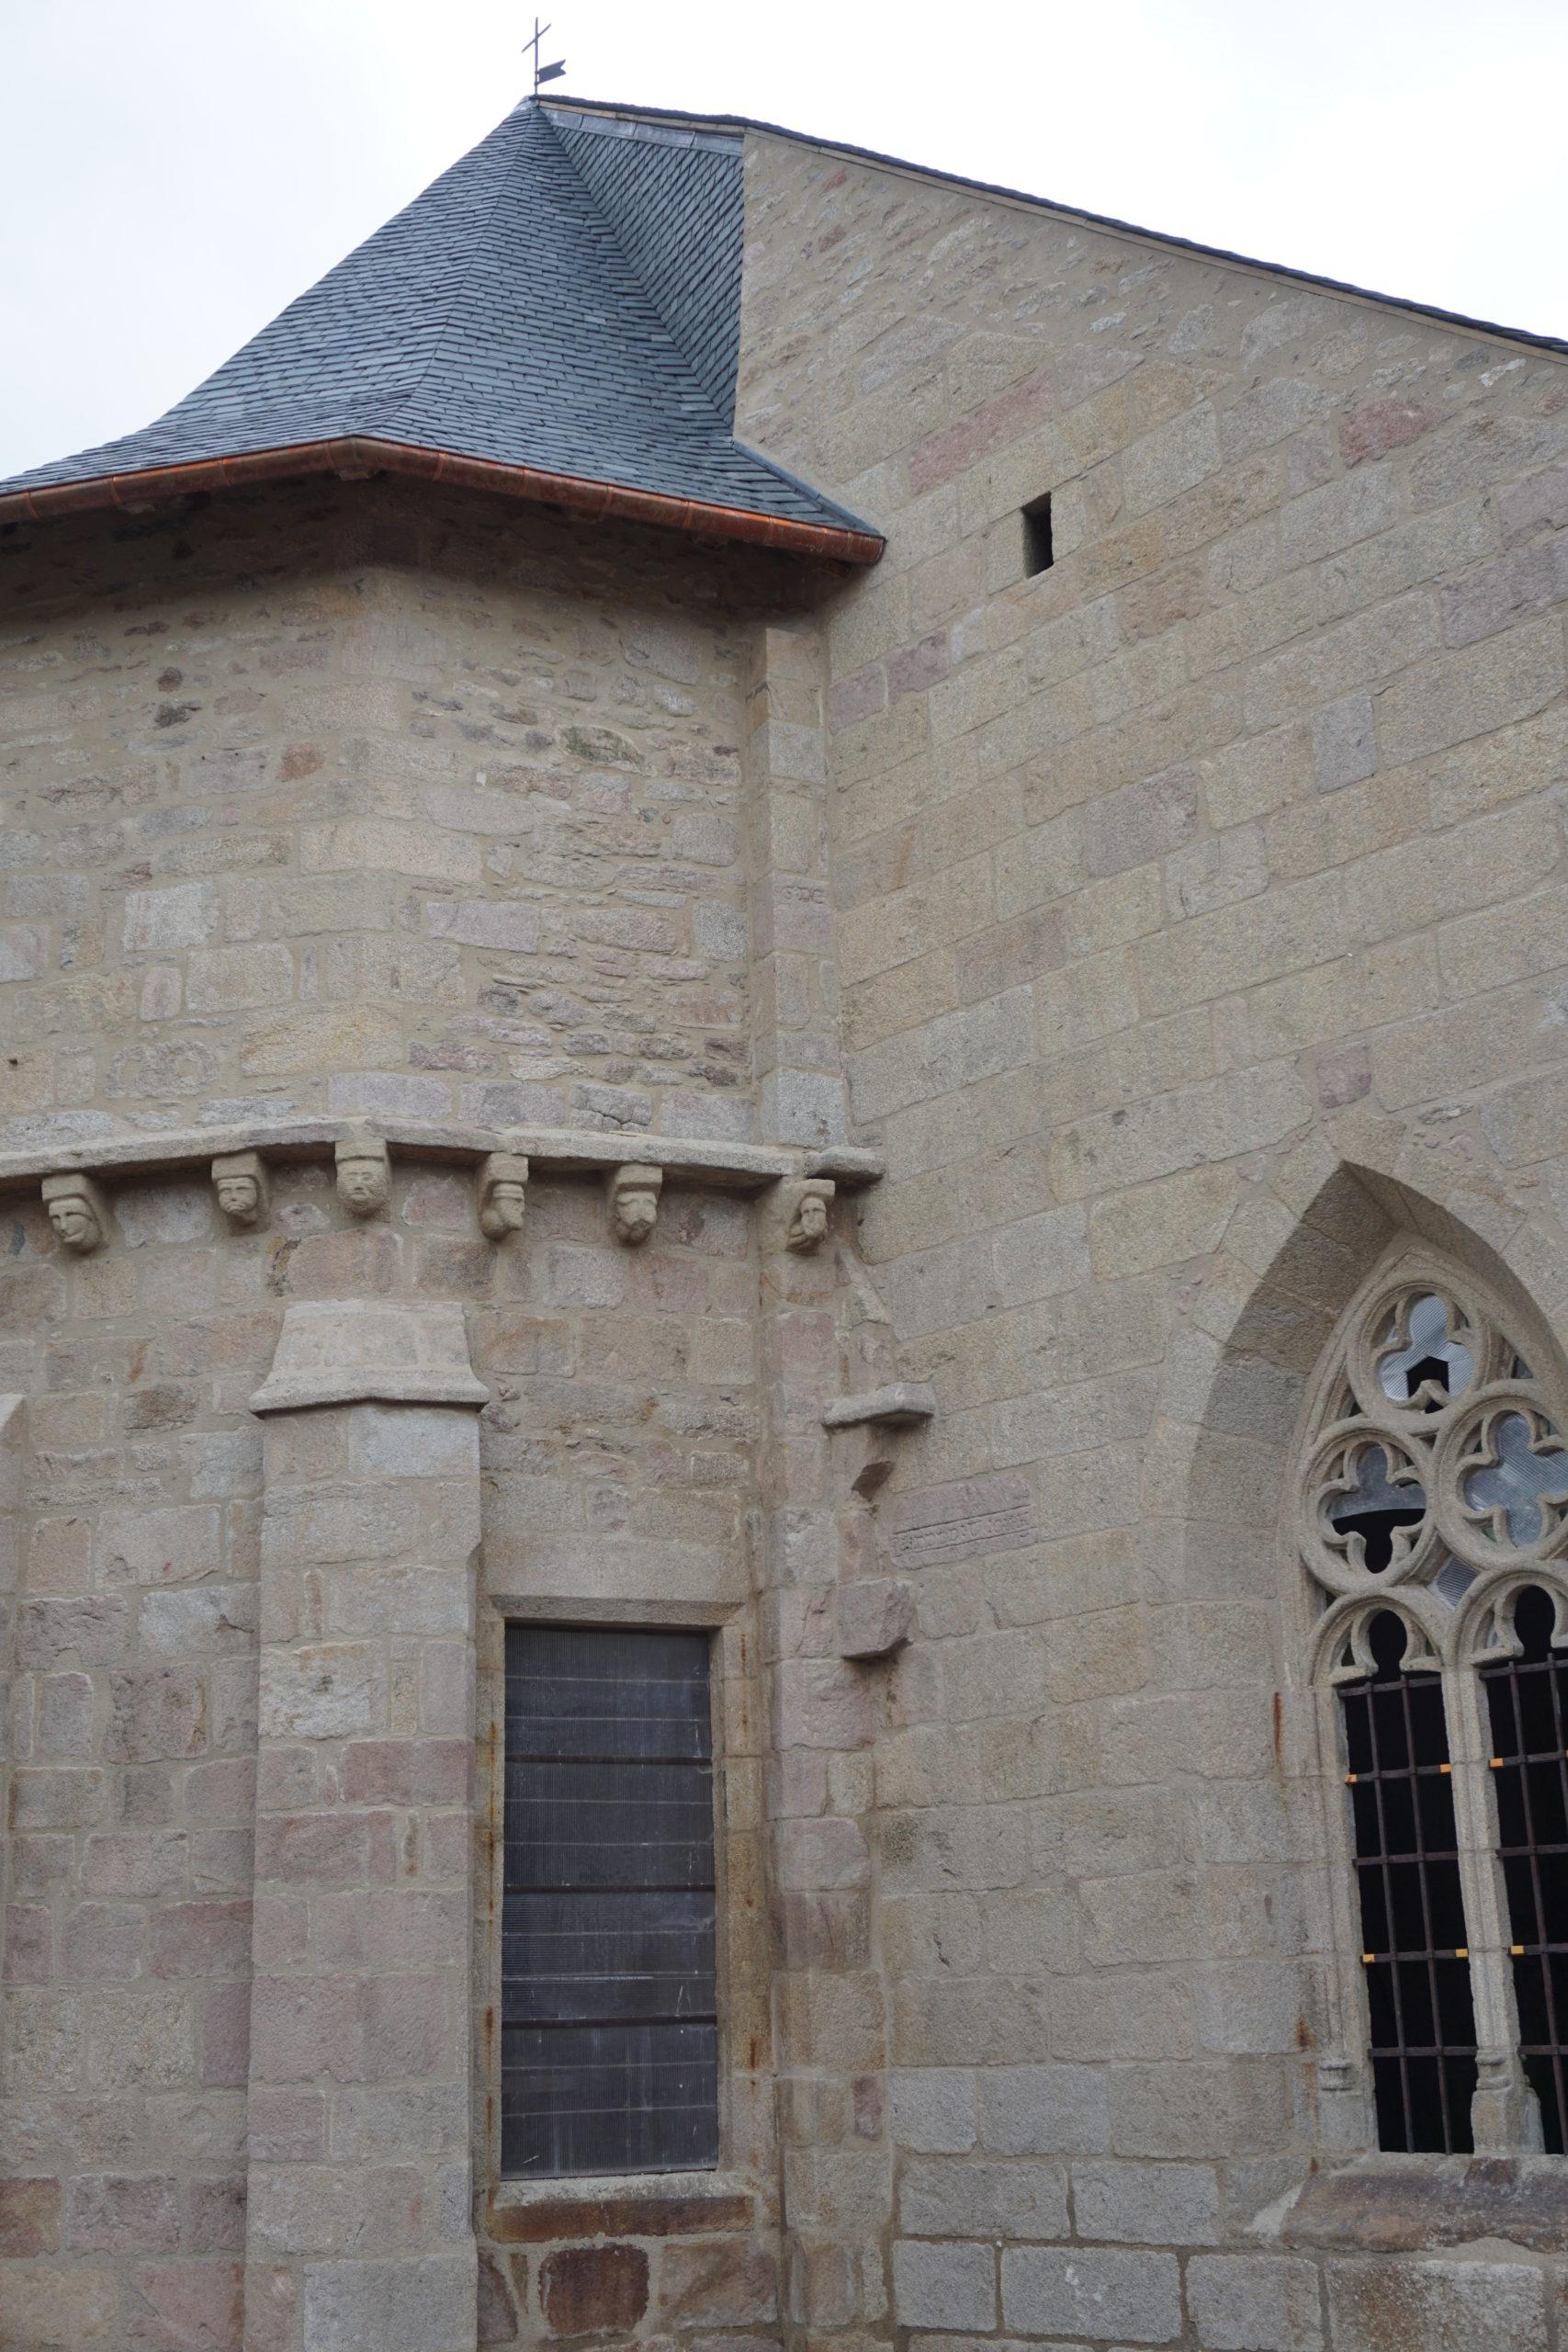 Eglise Saint Gilles Saint Georges – Tarnac (19)